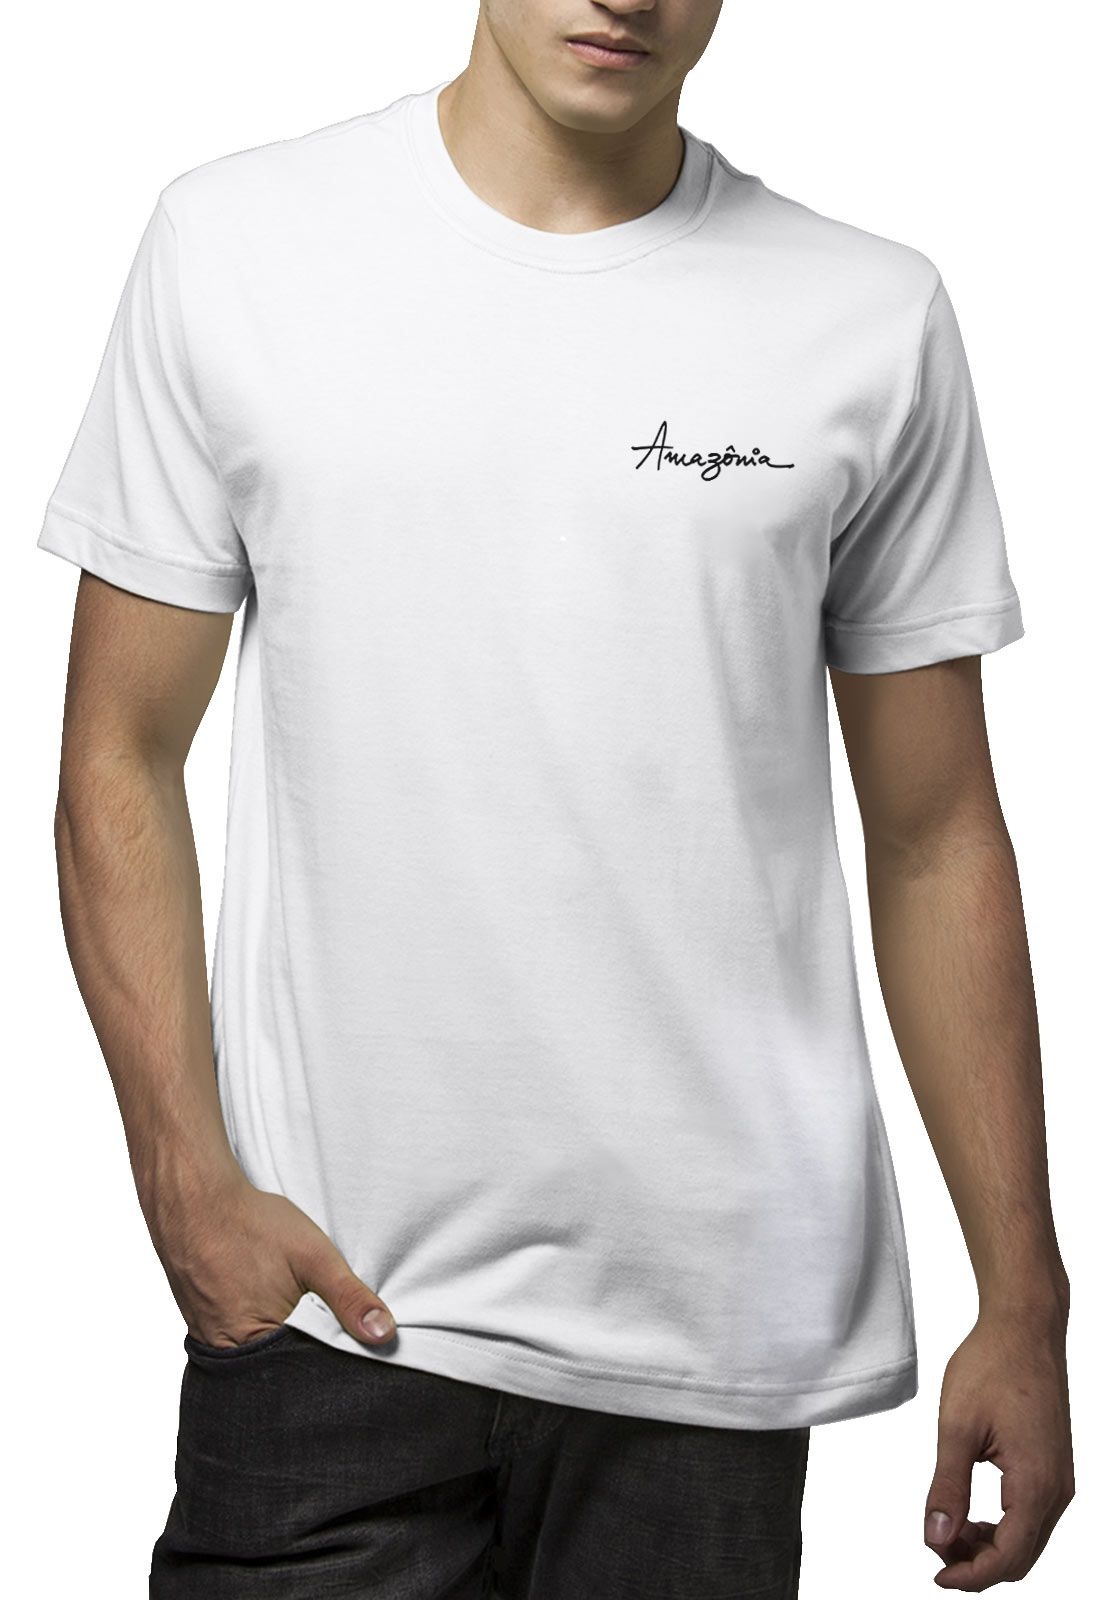 Camiseta Amazônia Quadro Araras - Branco